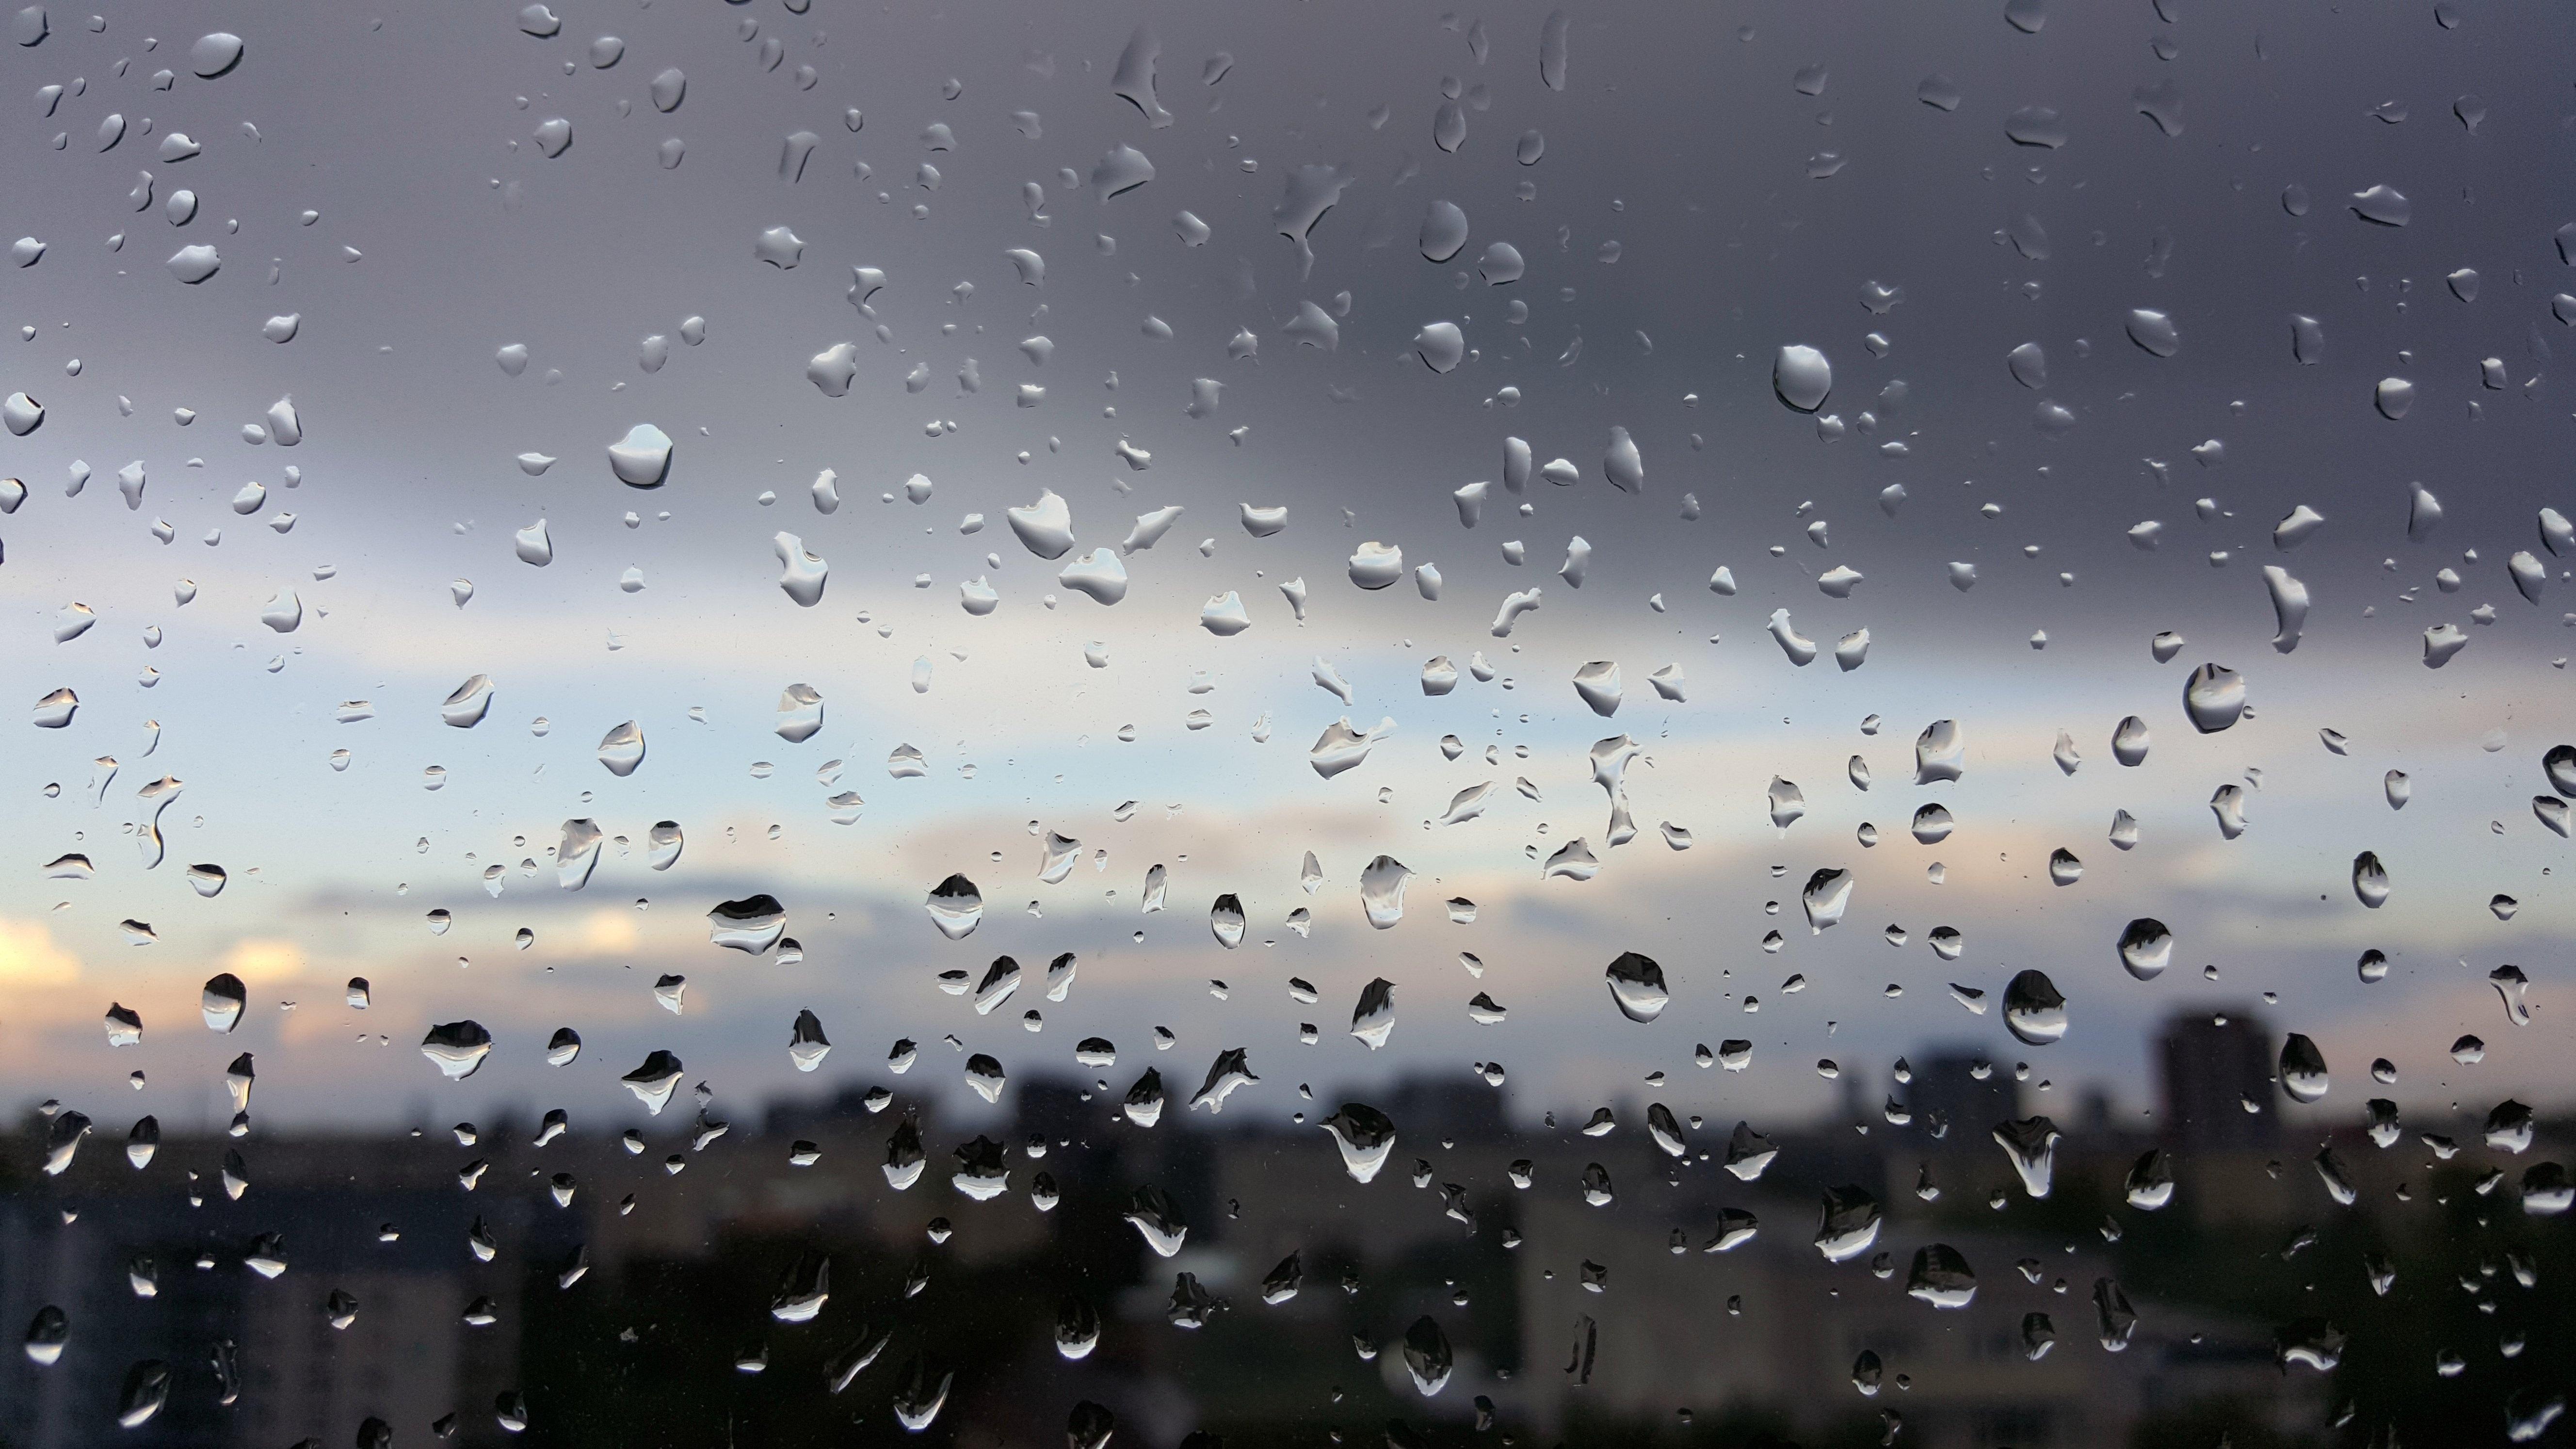 Gambar Salju Musim Dingin Penurunan Langit Udara Hujan